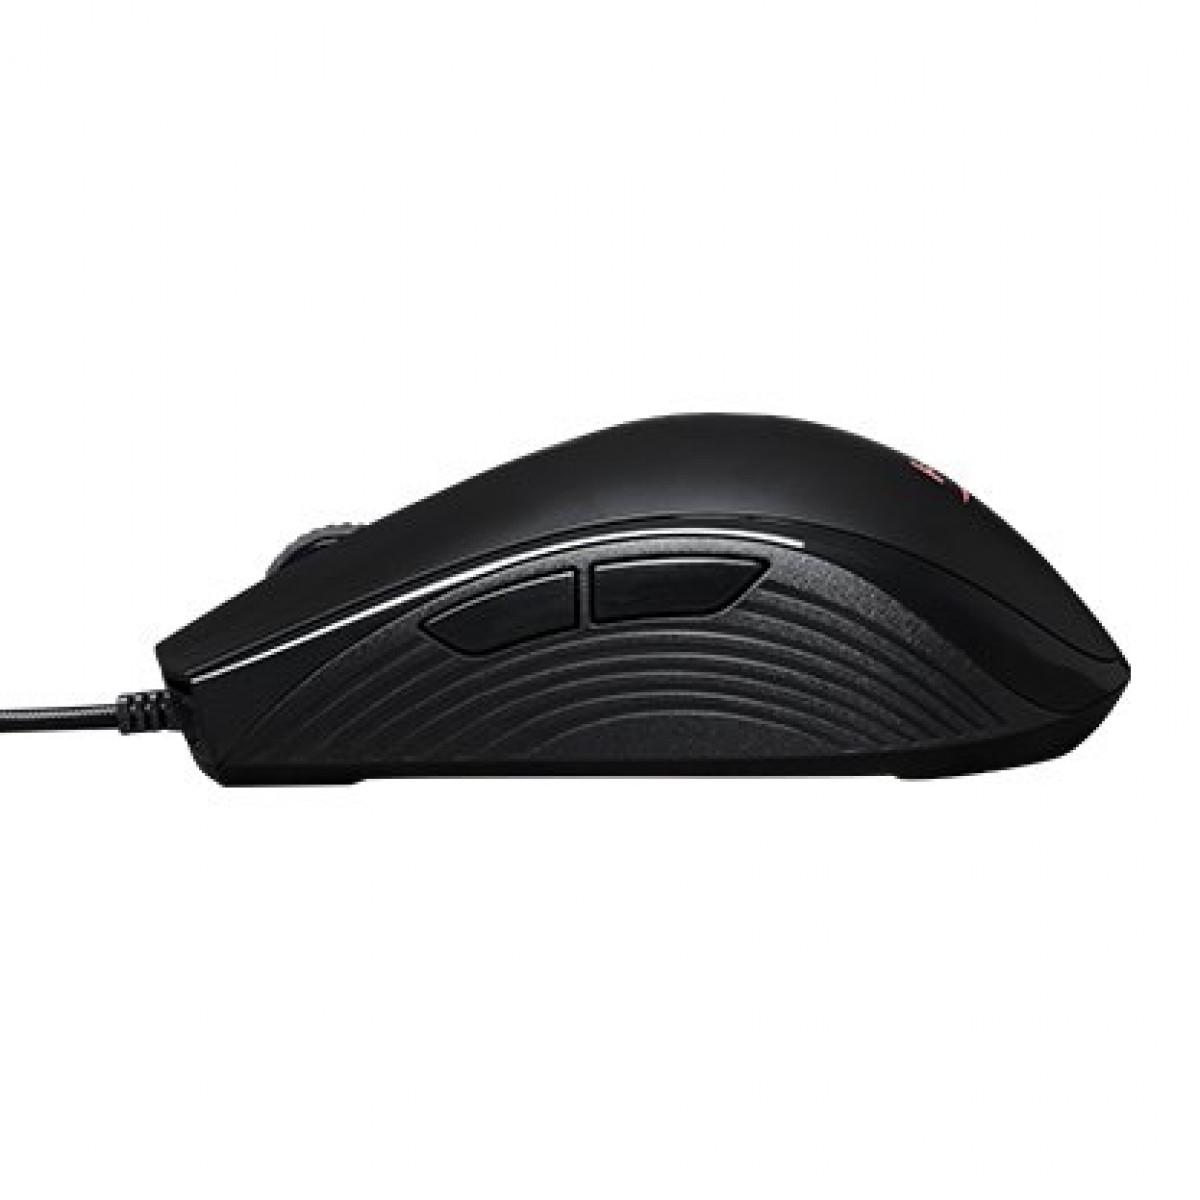 Mouse Gamer HyperX Pulsefire Core RGB, 6200 DPI, 7 botões programáveis, USB, Black